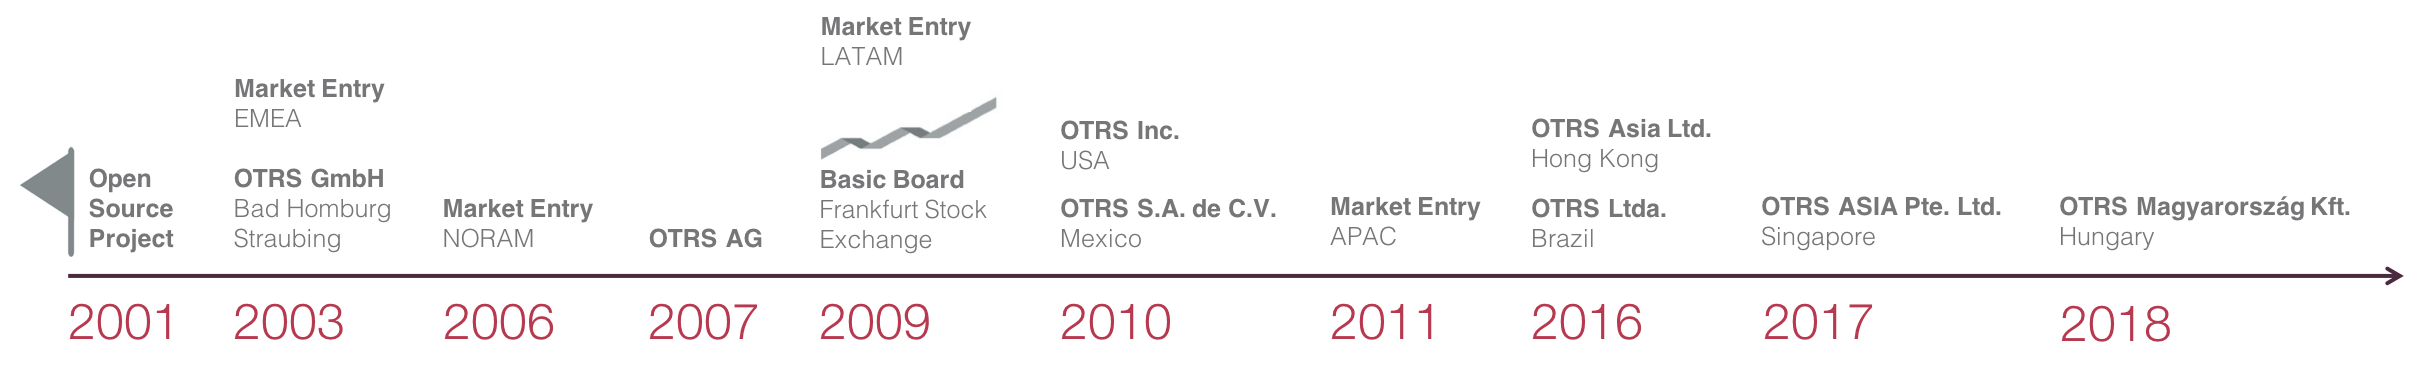 Milestones of OTRS